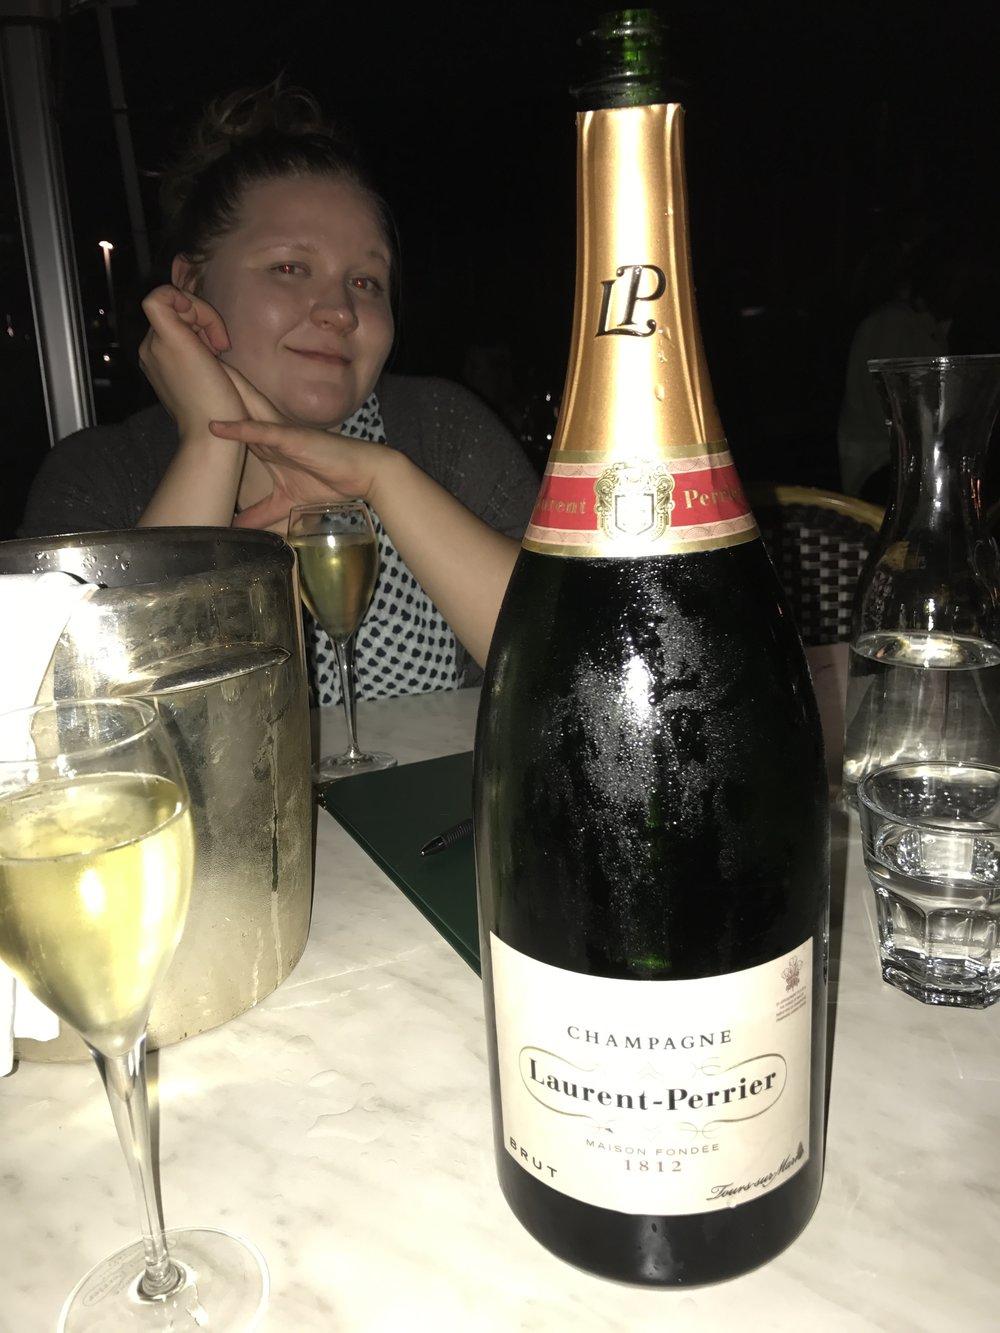 Riksu ja Champagne